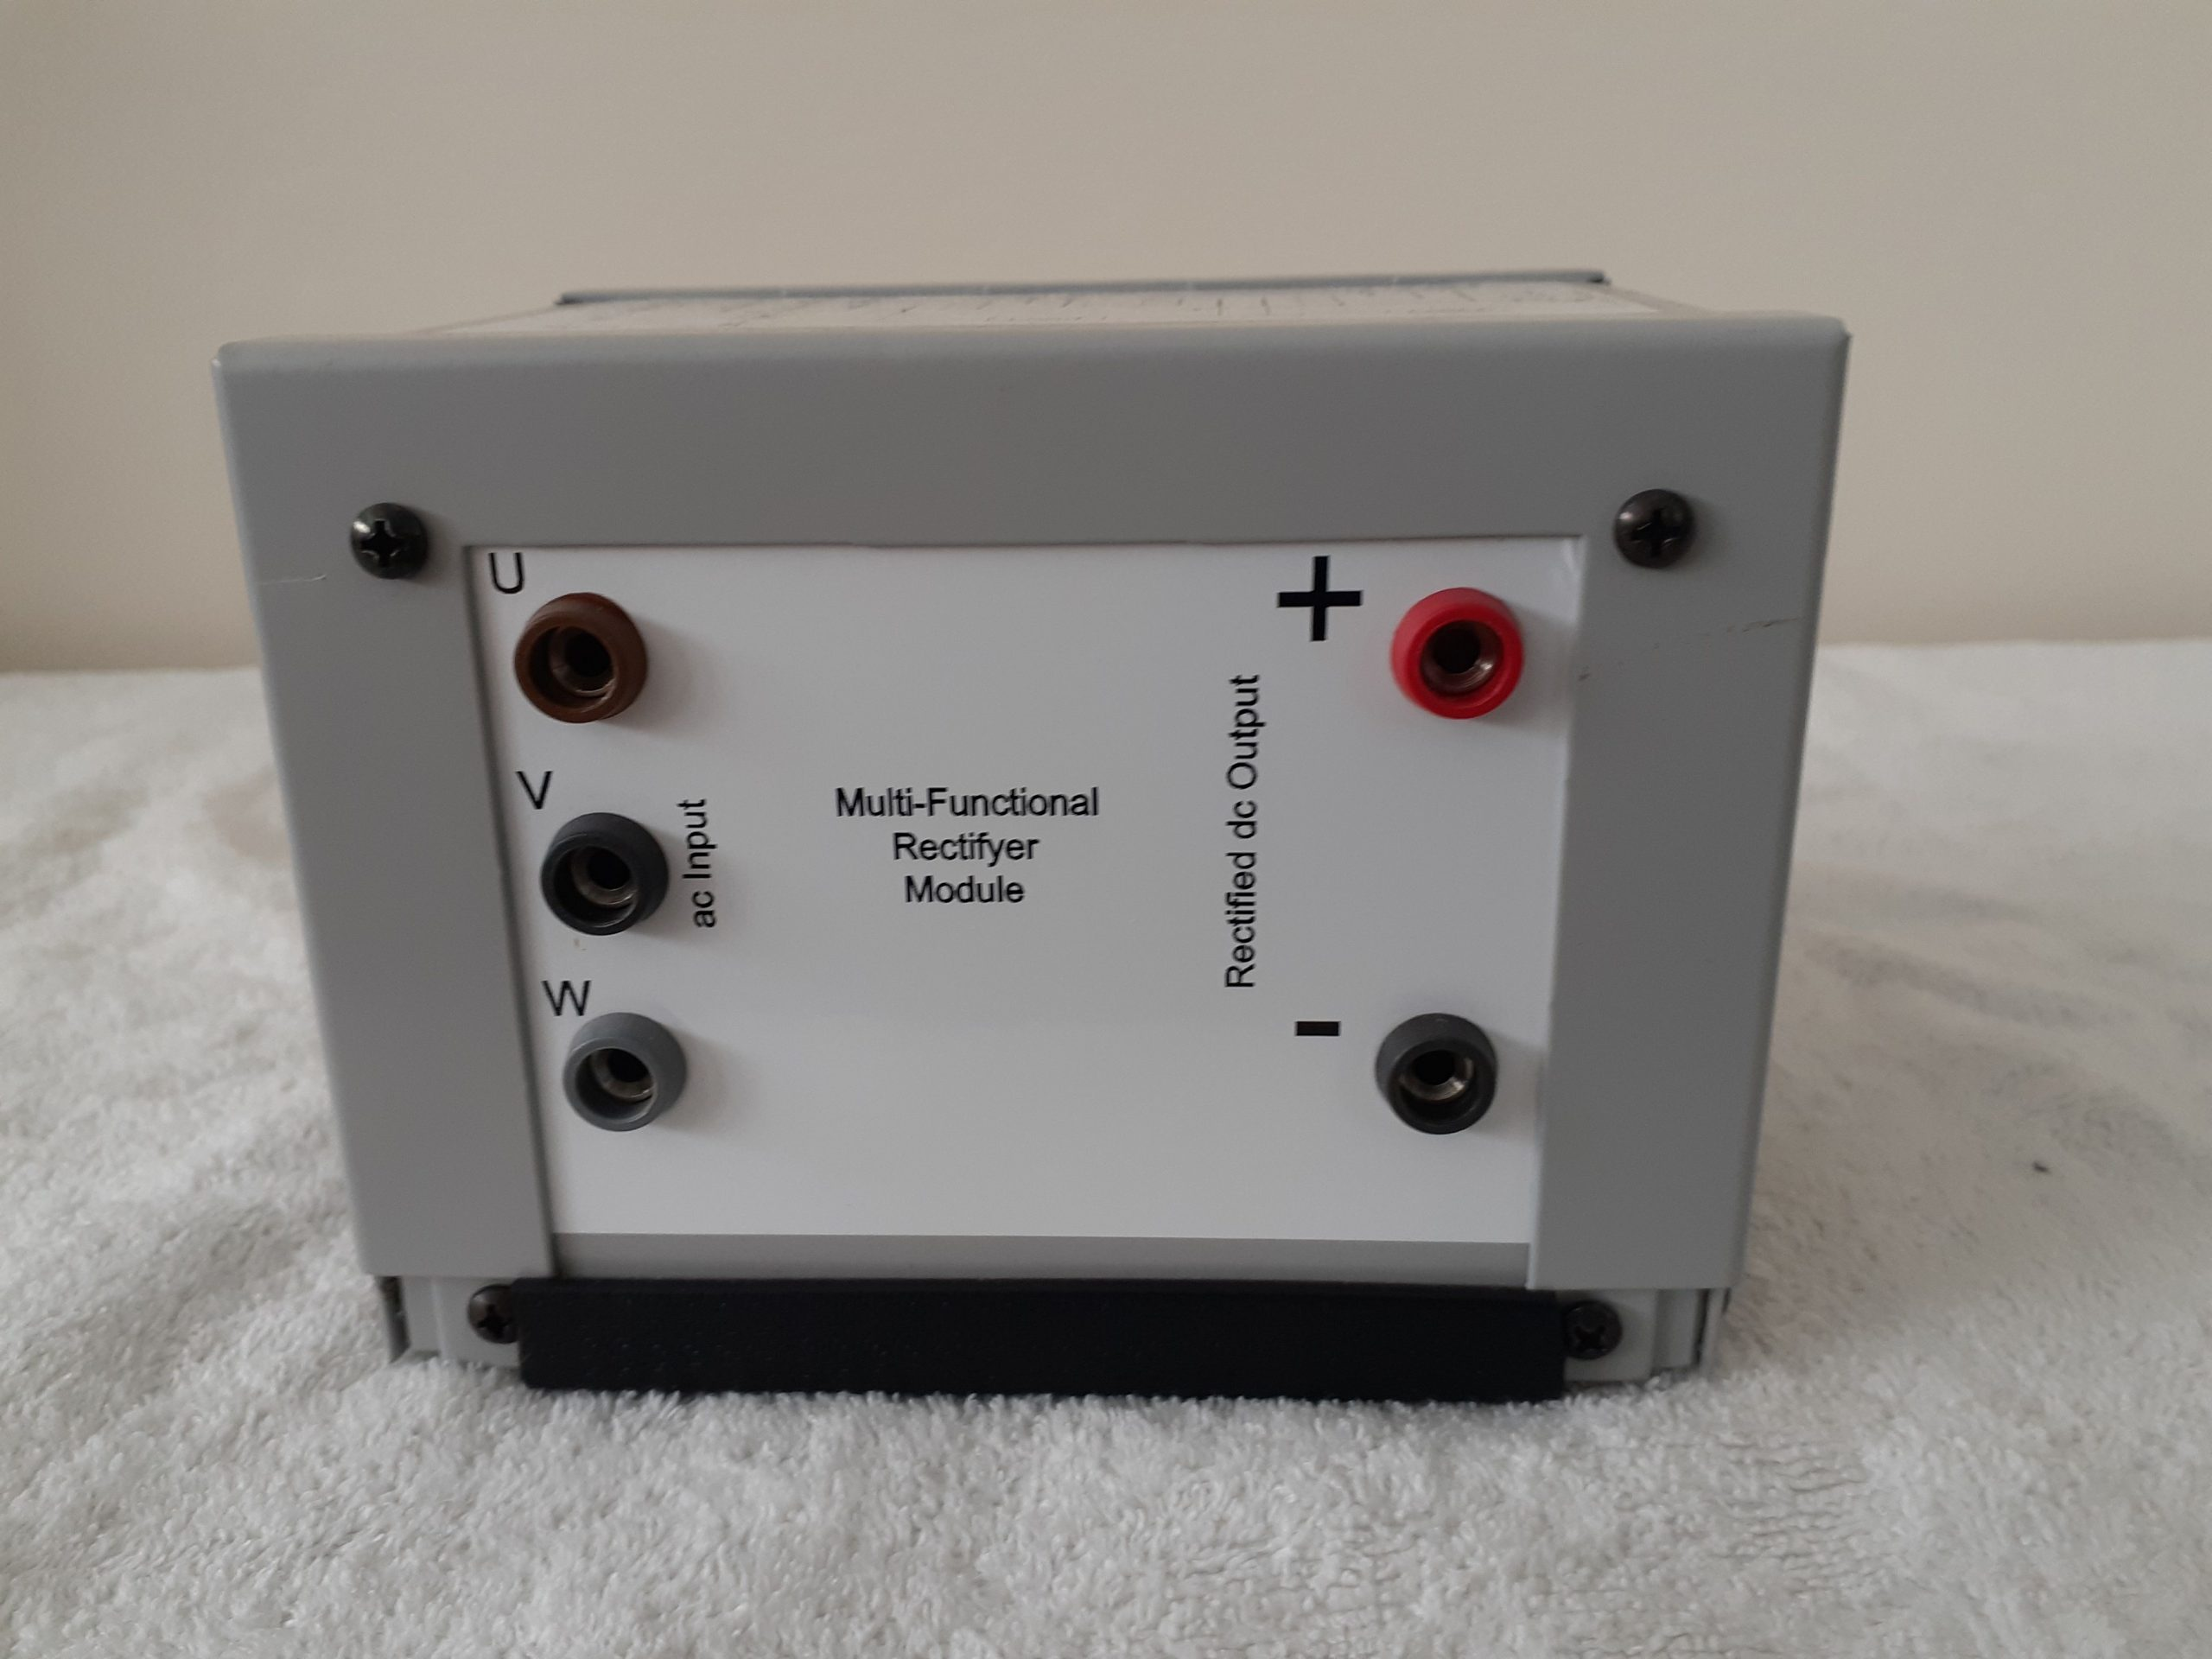 190914: Multi-functional Rectifier Module Image